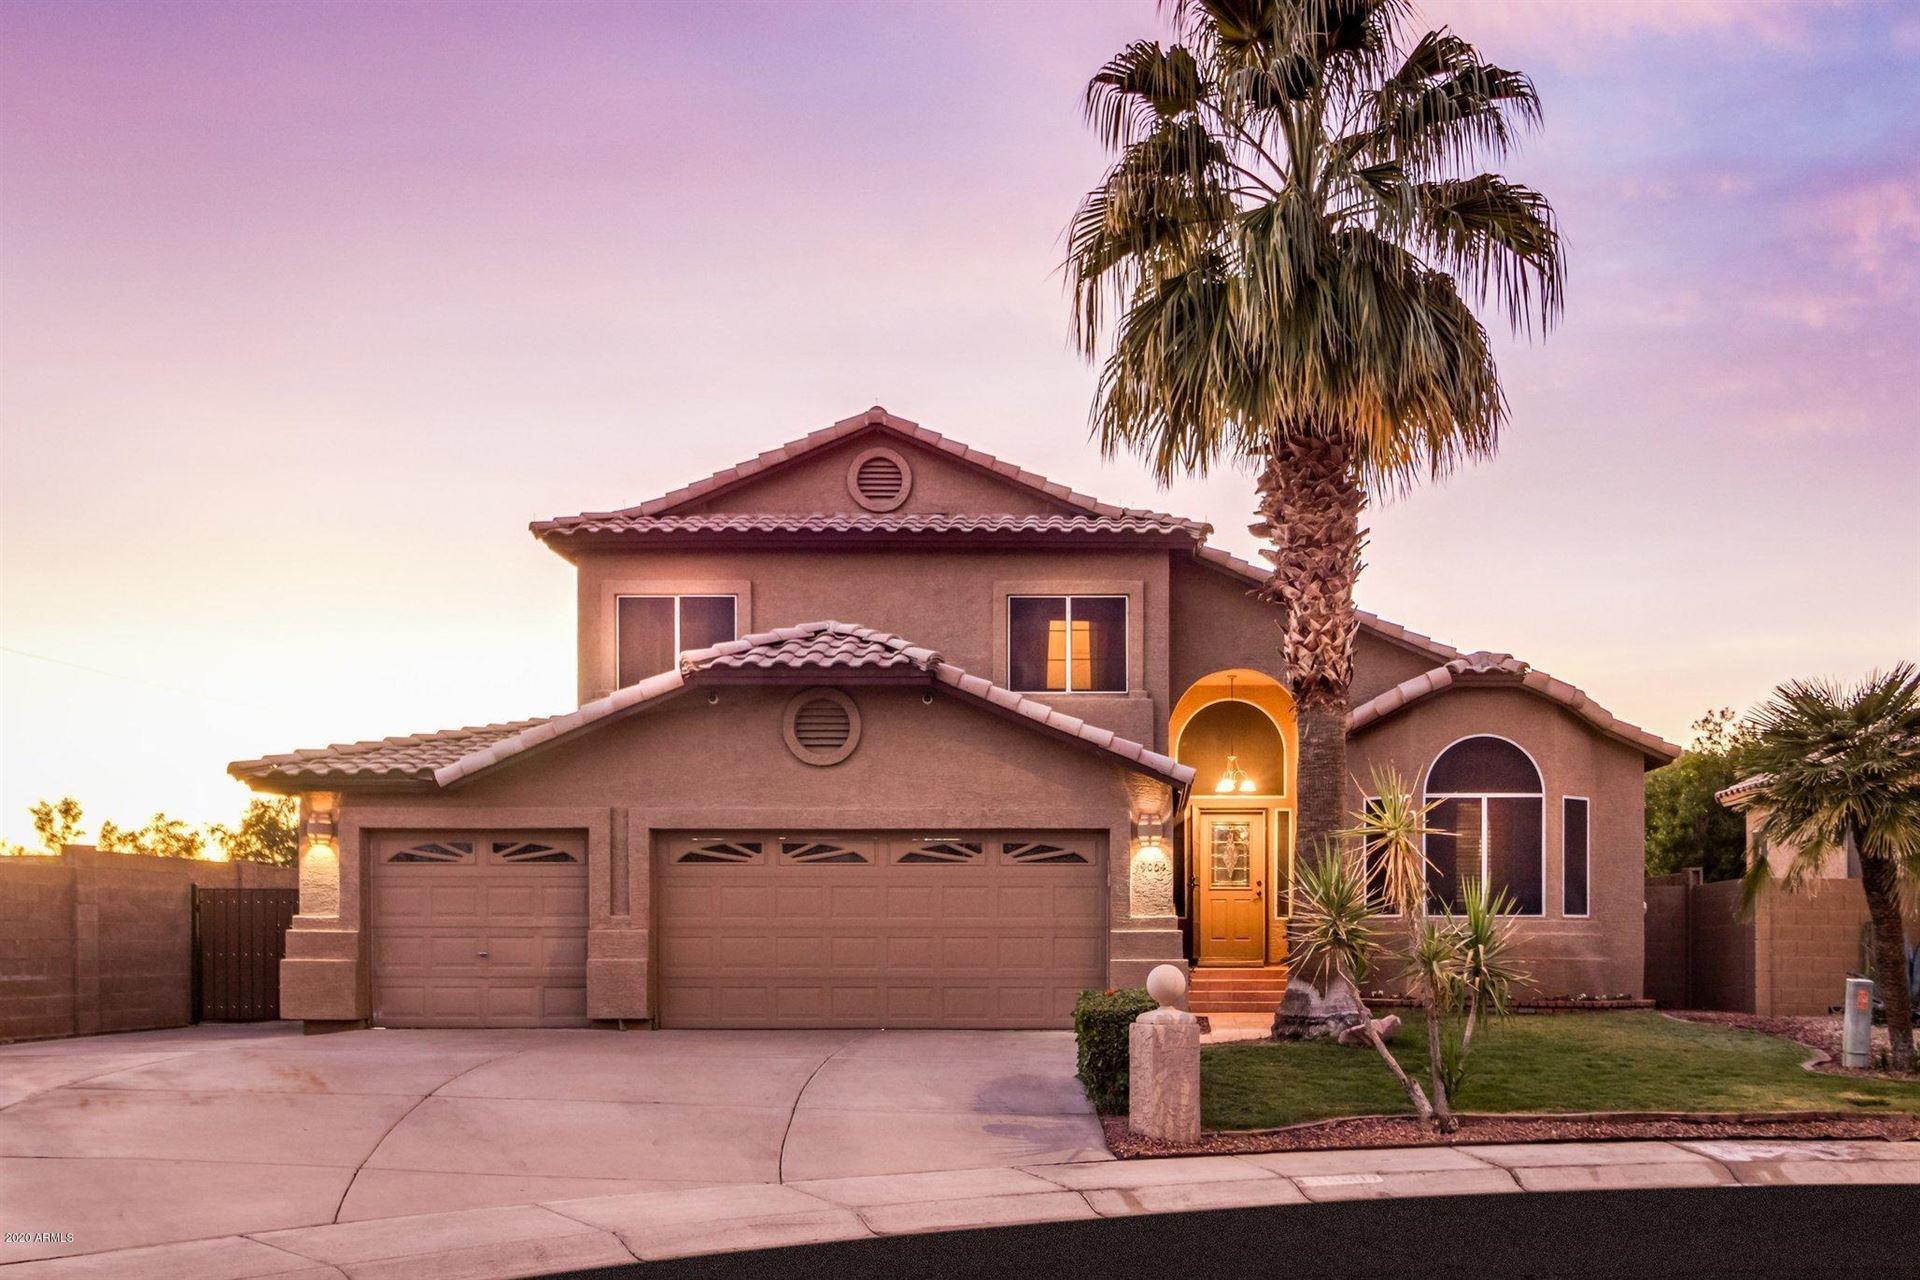 19004 N 25TH Street, Phoenix, AZ 85050 - MLS#: 6162544